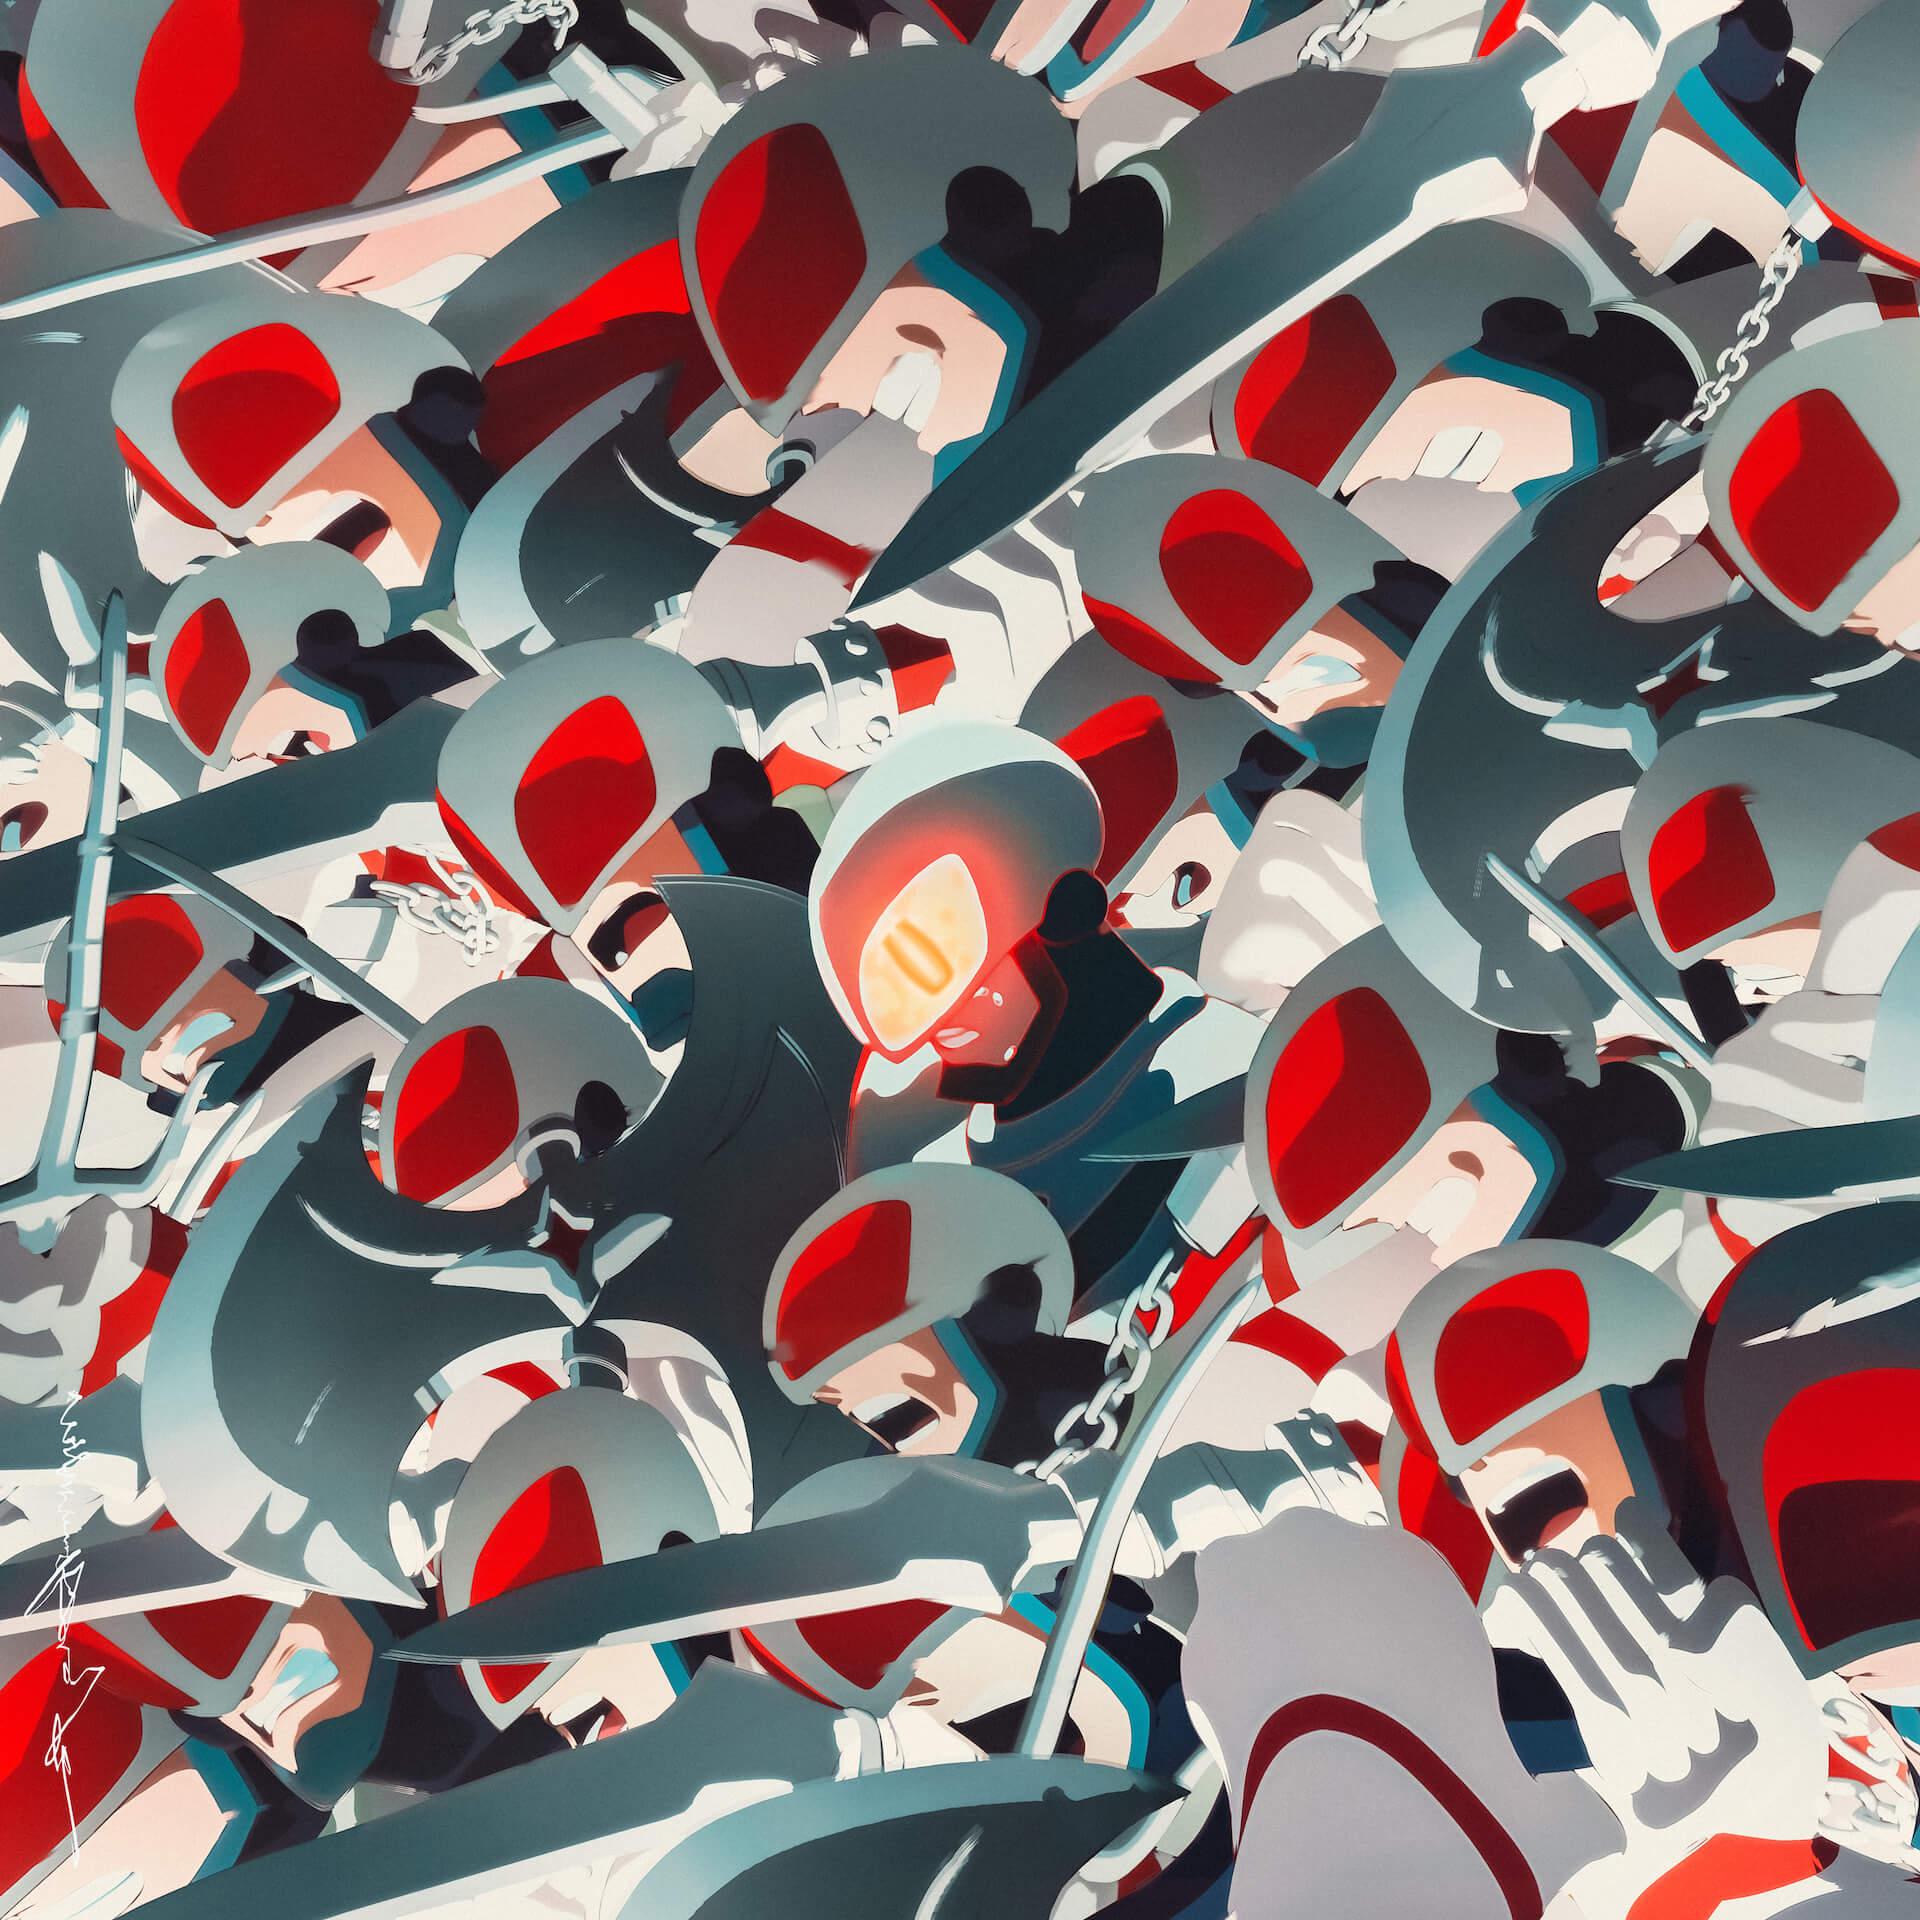 millennium parade × Belle(中村佳穂)による『U』のアートワークが解禁!細田守監督最新作『竜とそばかすの姫』主題歌 music210702_millenniumparade_2